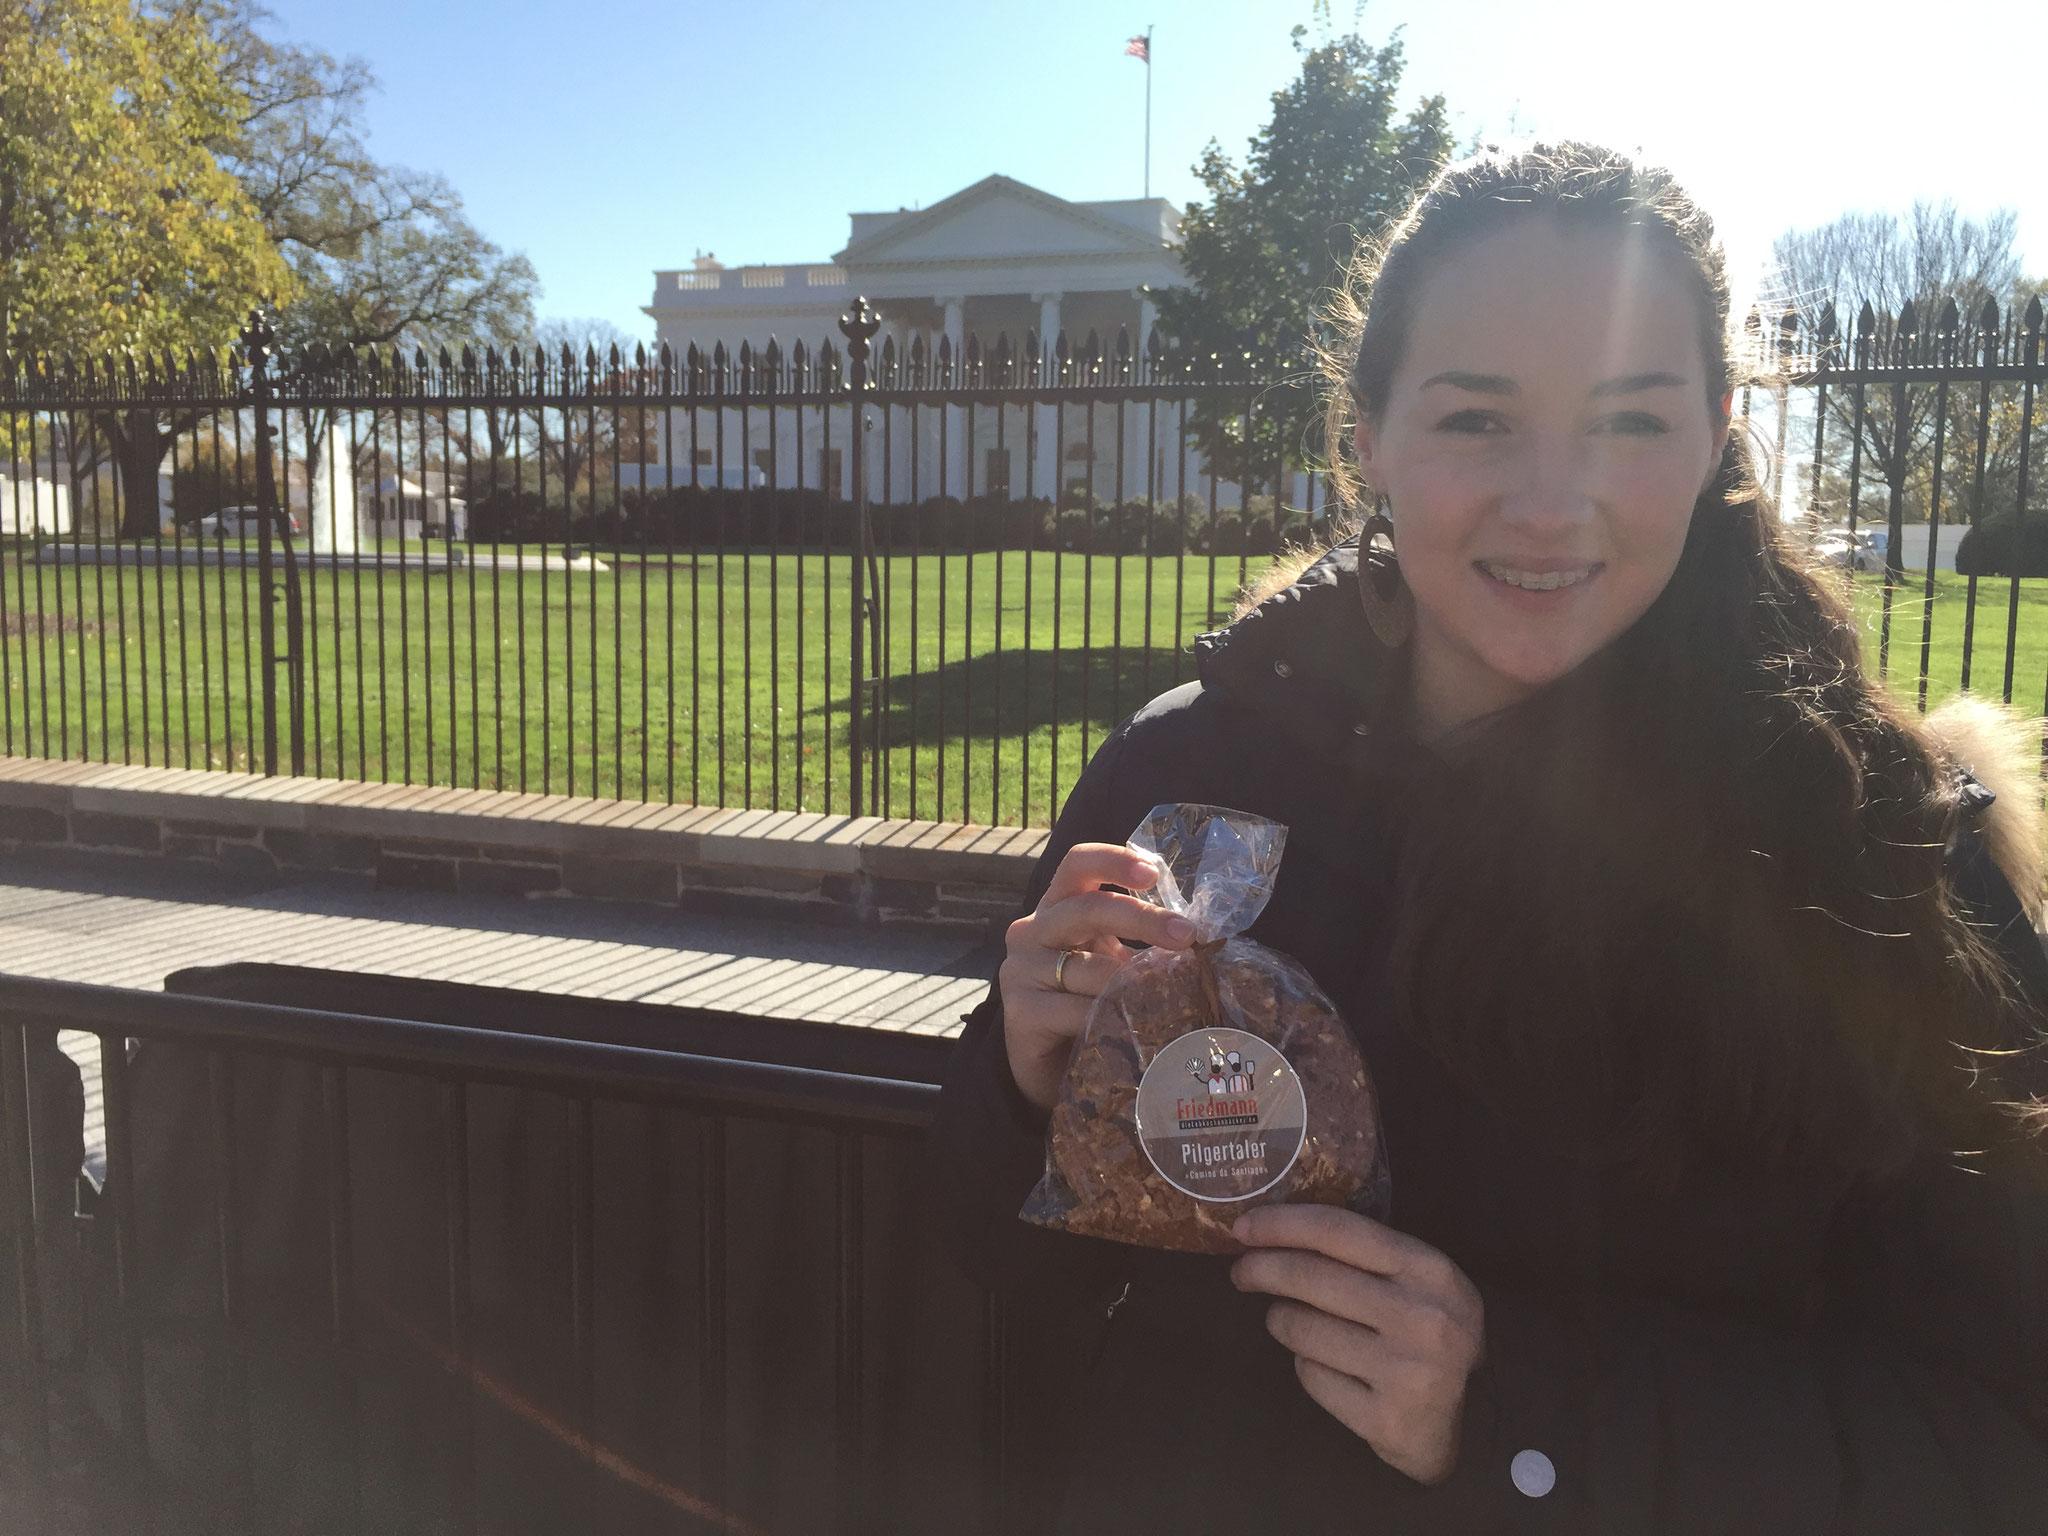 Nordamerika USA Weißes Haus Washington, D.C  Nov. 2015